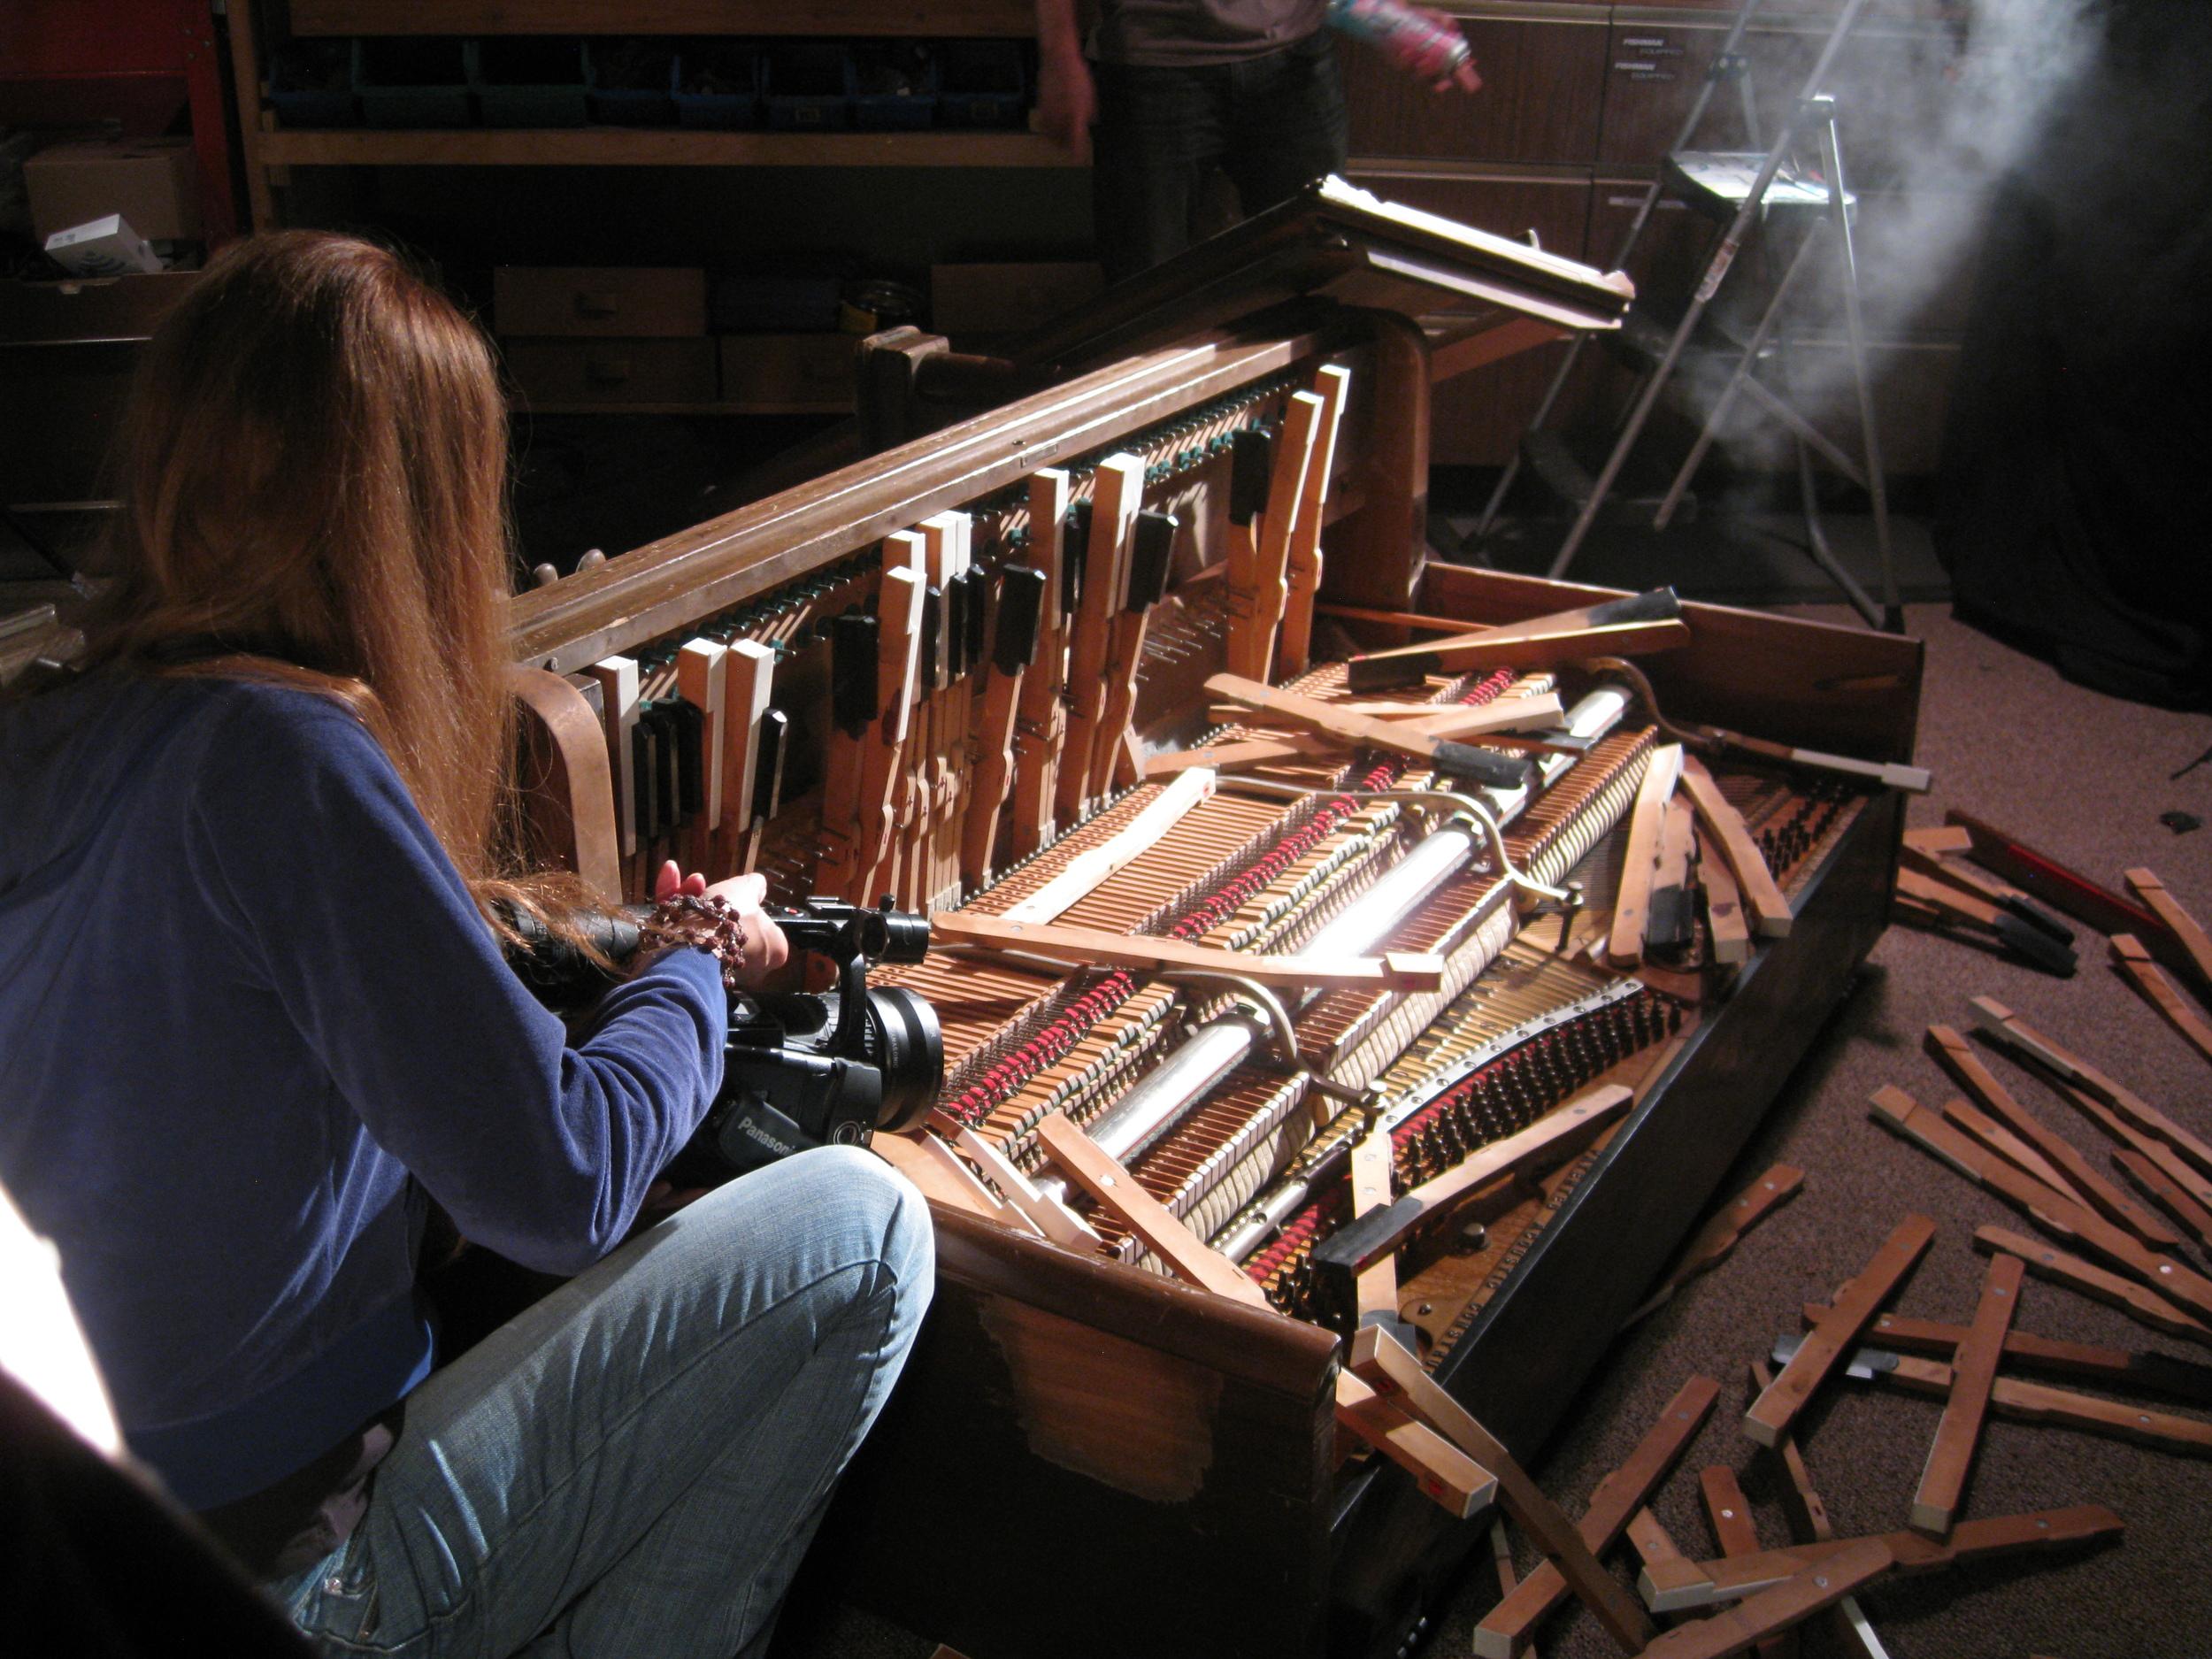 tina-guo-paul-spaeth-redemption-piano-cello-33.JPG